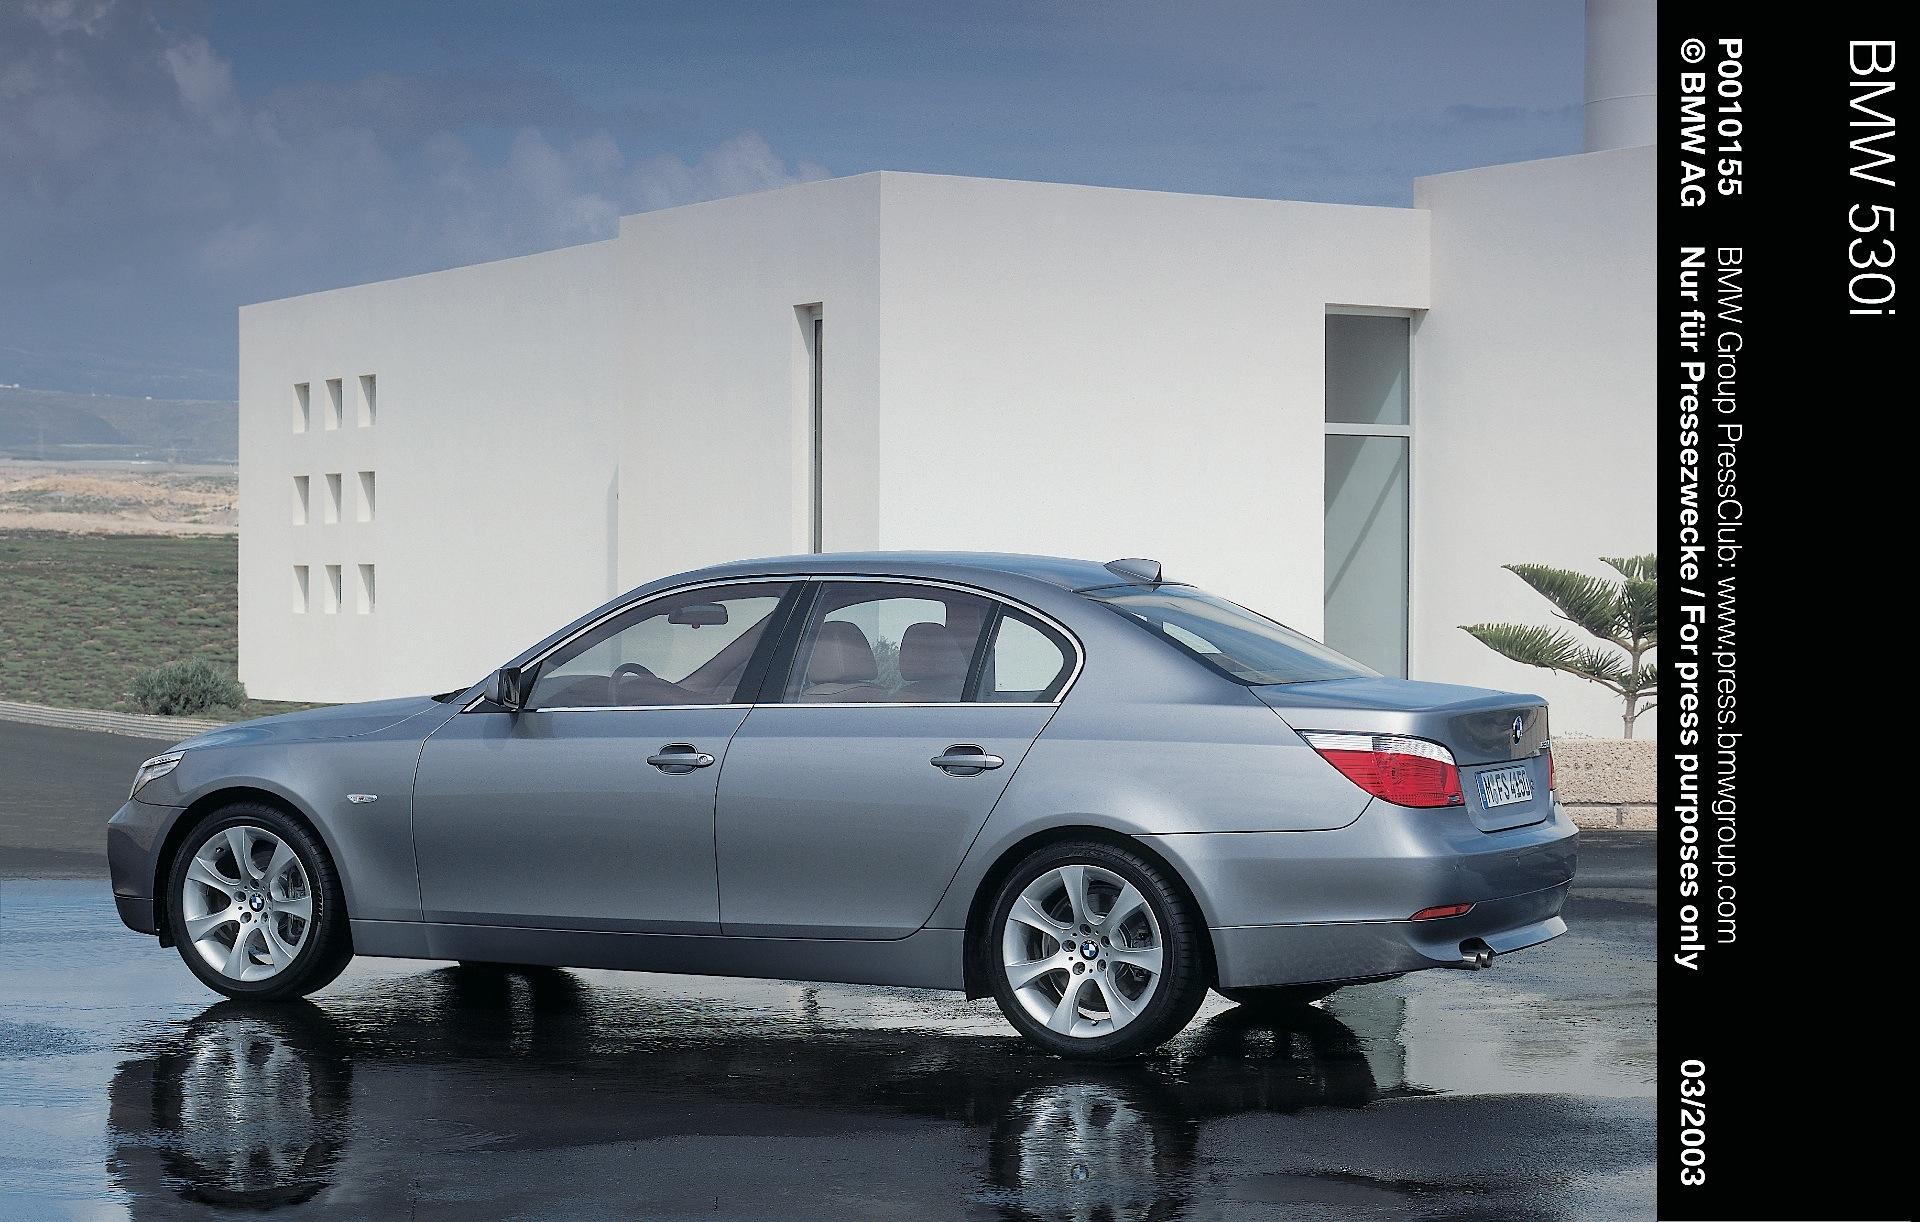 Prospectus BMW e61 5er Touring 525i 545i 525d 530d 1 2004